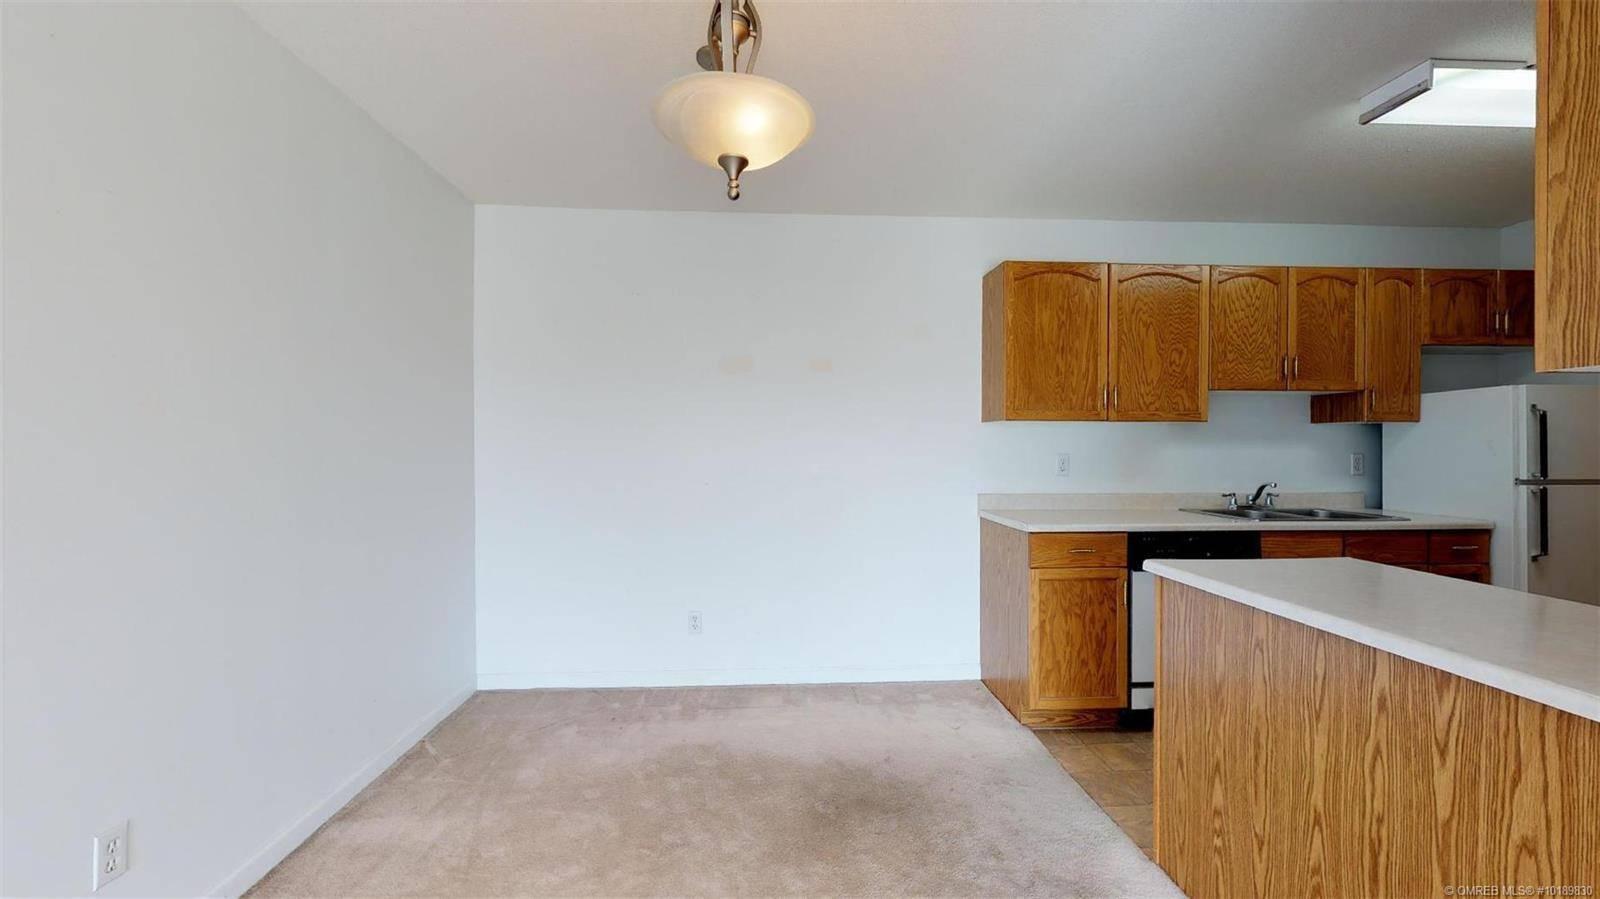 Condo for sale at 769 Klo Rd Unit 304 Kelowna British Columbia - MLS: 10189830